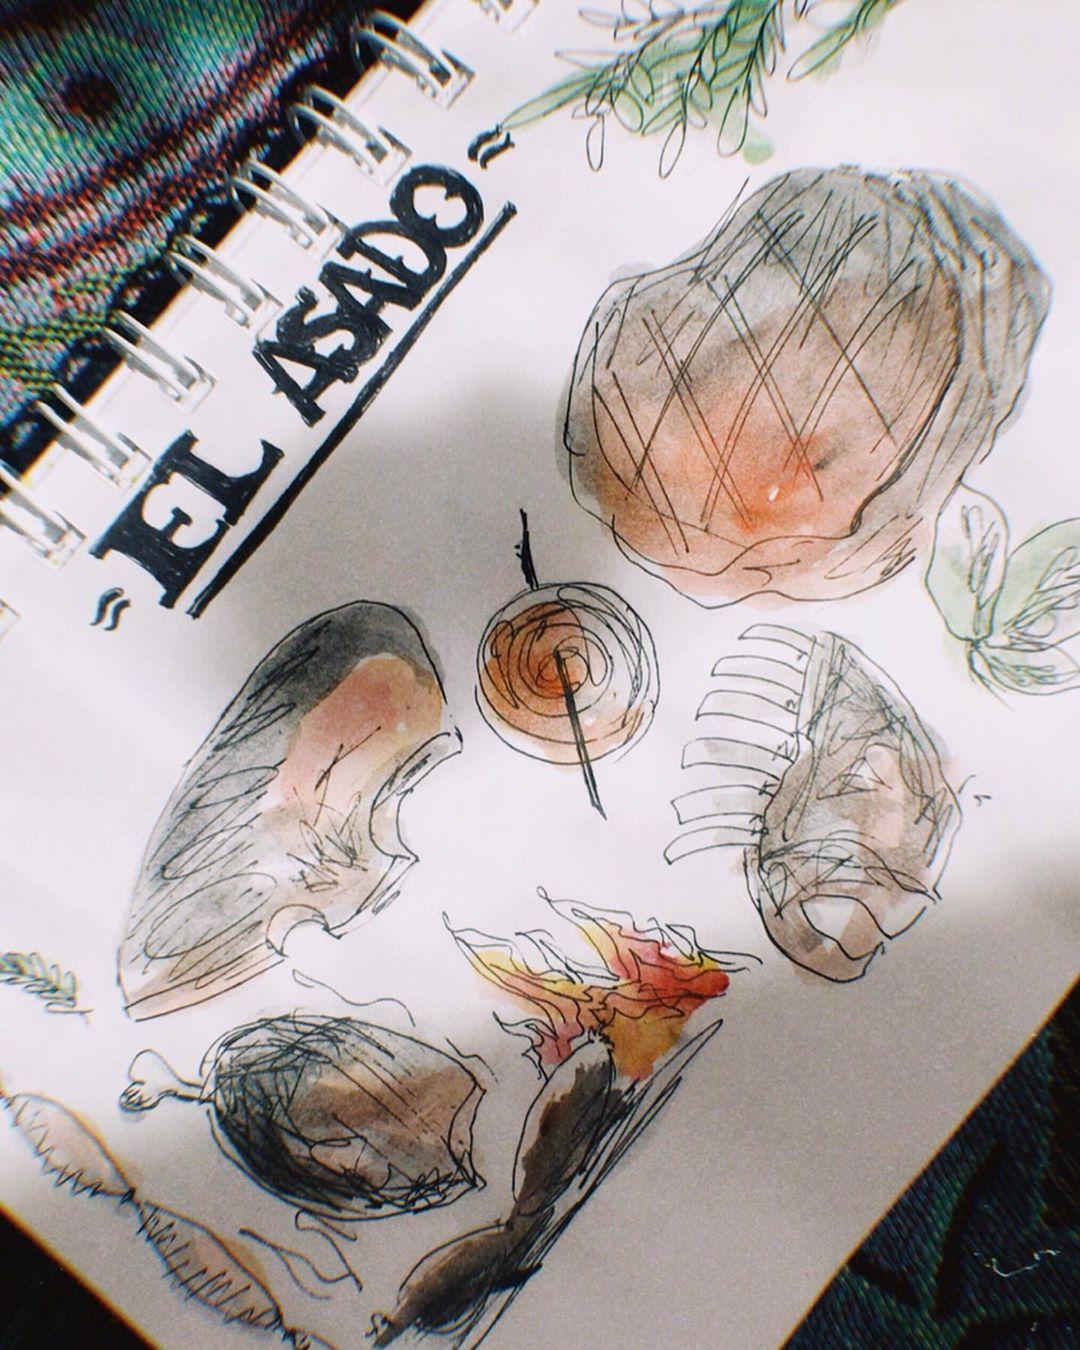 | EL AMOR |  _______________________________________________________________  #illustrationartists #illustragram #illustration #sketch #sketch_book #sketchbook #sketchdaily #meat  #food #foodie #comida #draw #drawing #elasado #asado #freelancerdesigner #creative #artistsoninstagram #artistsupport #design #dibujo #dibujos #lavidaendibujo #ilustrador #artist #illustratice #ba #buenosaires